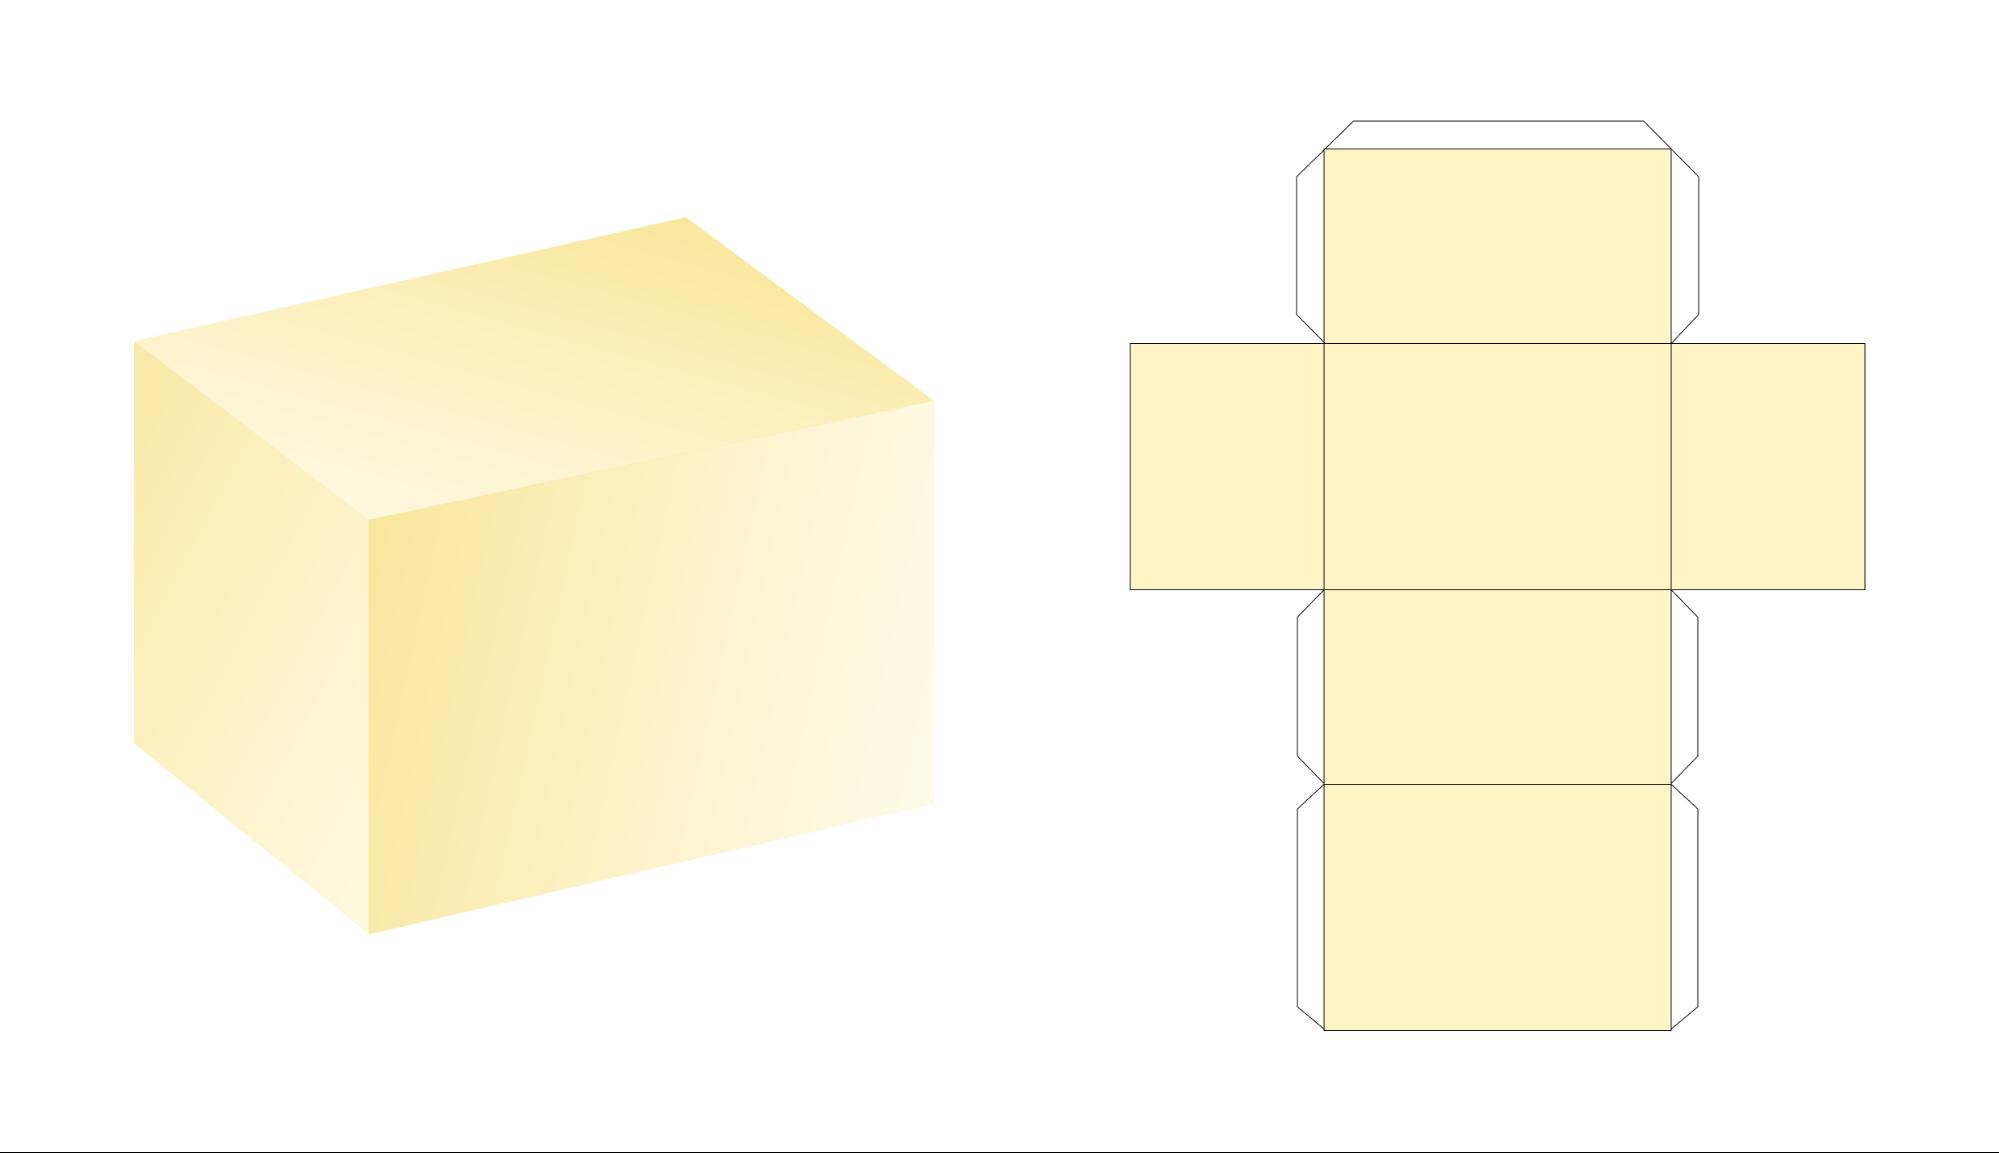 Прямоугольный параллелепипед 2